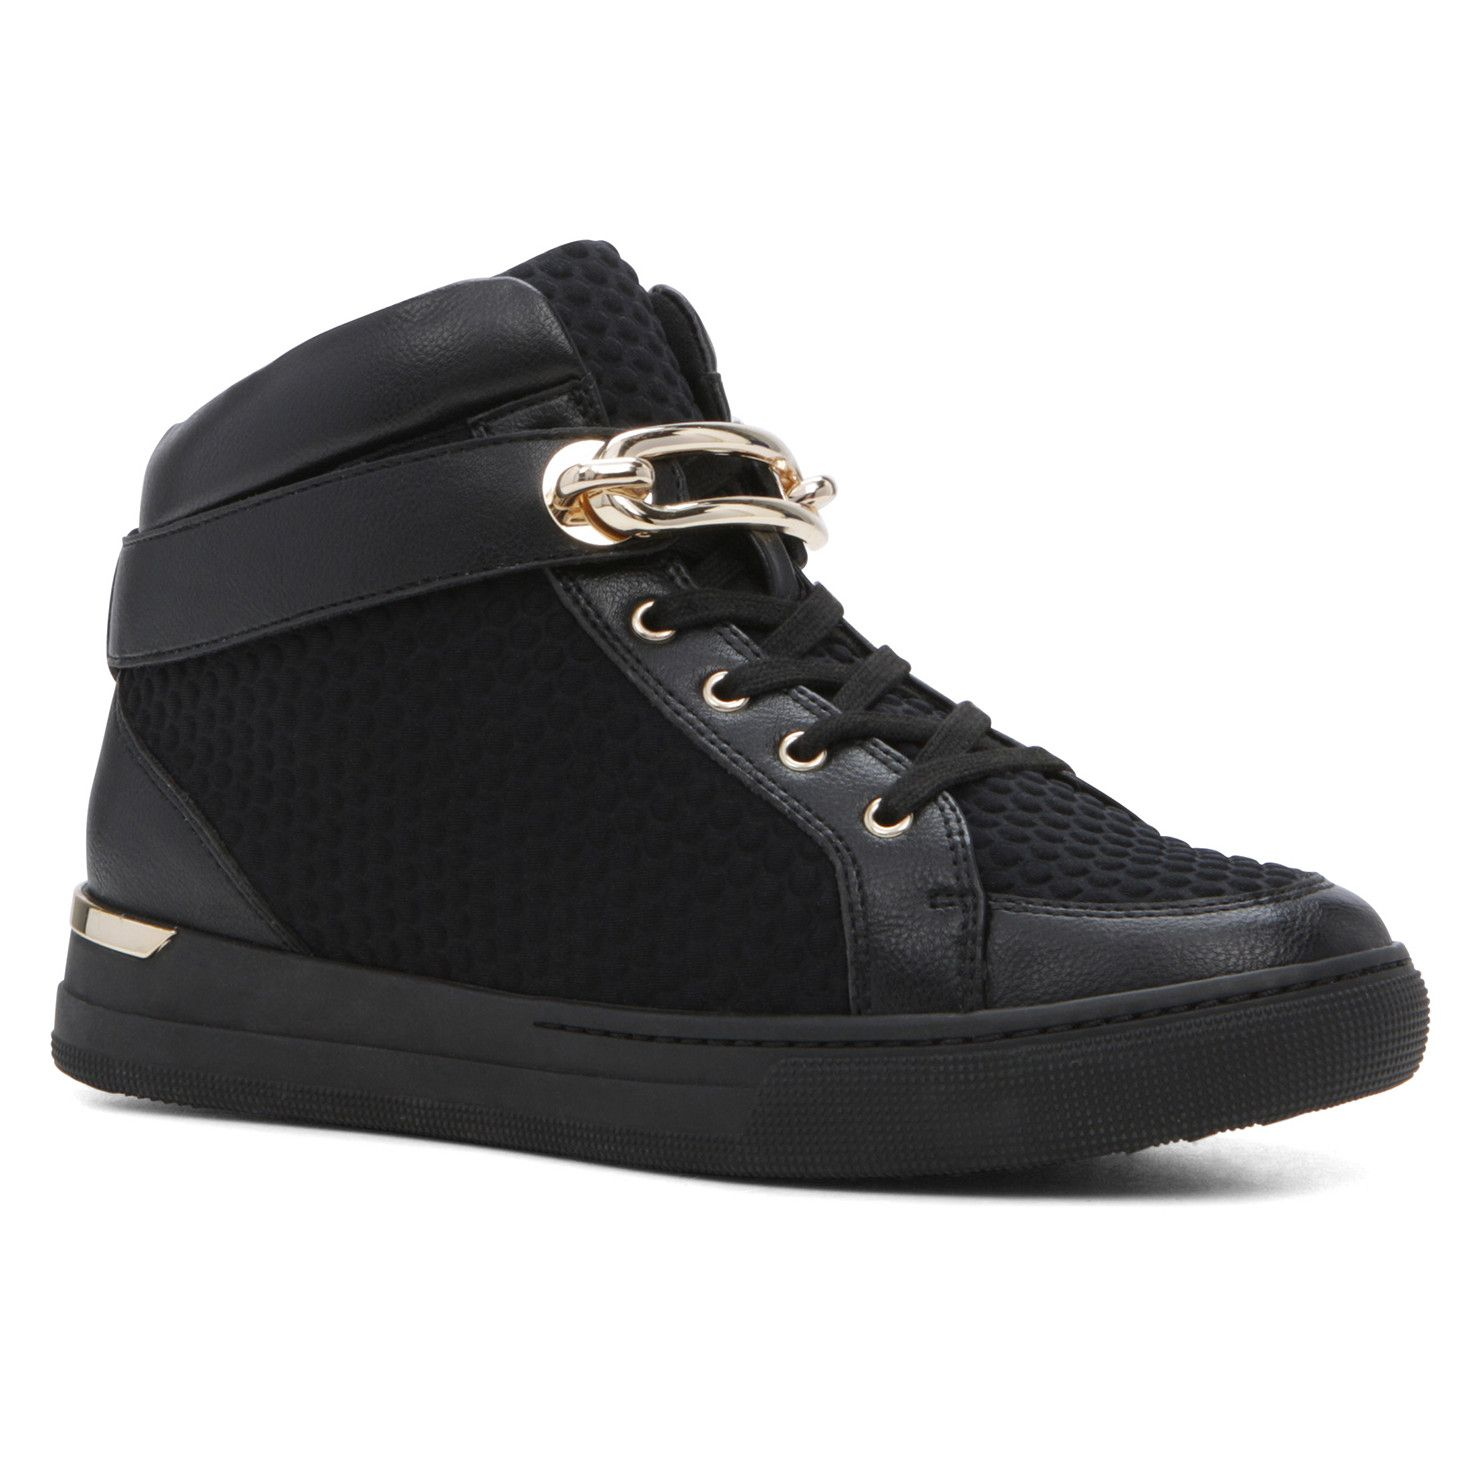 STORO Sneakers Women s Shoes